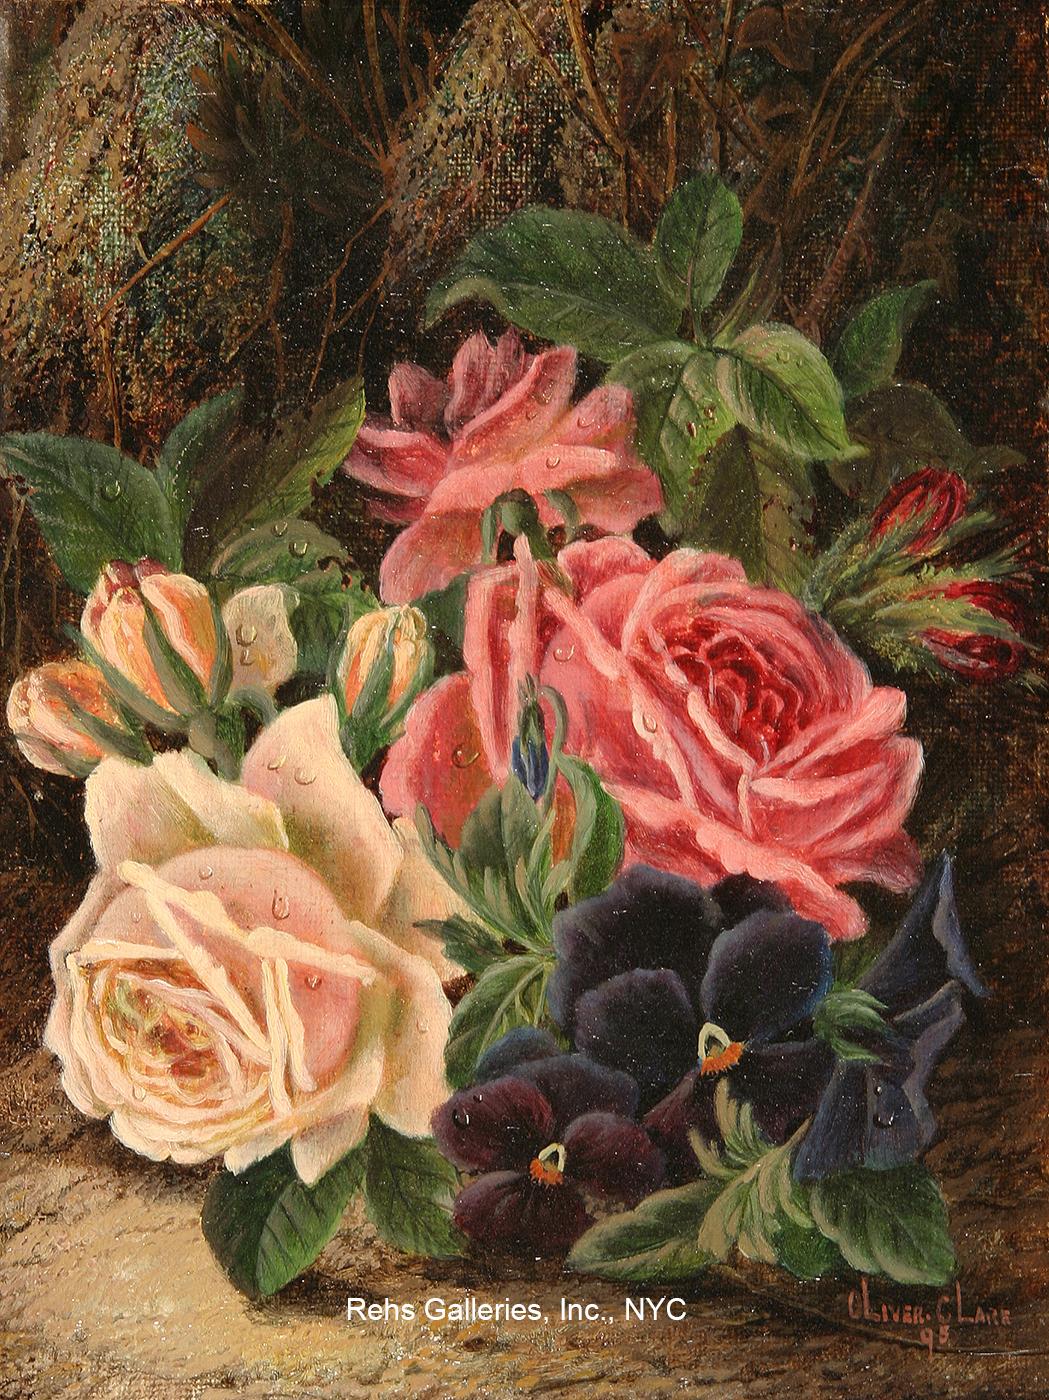 oliver_clare_a3559_still_life_of_roses_wm.jpg